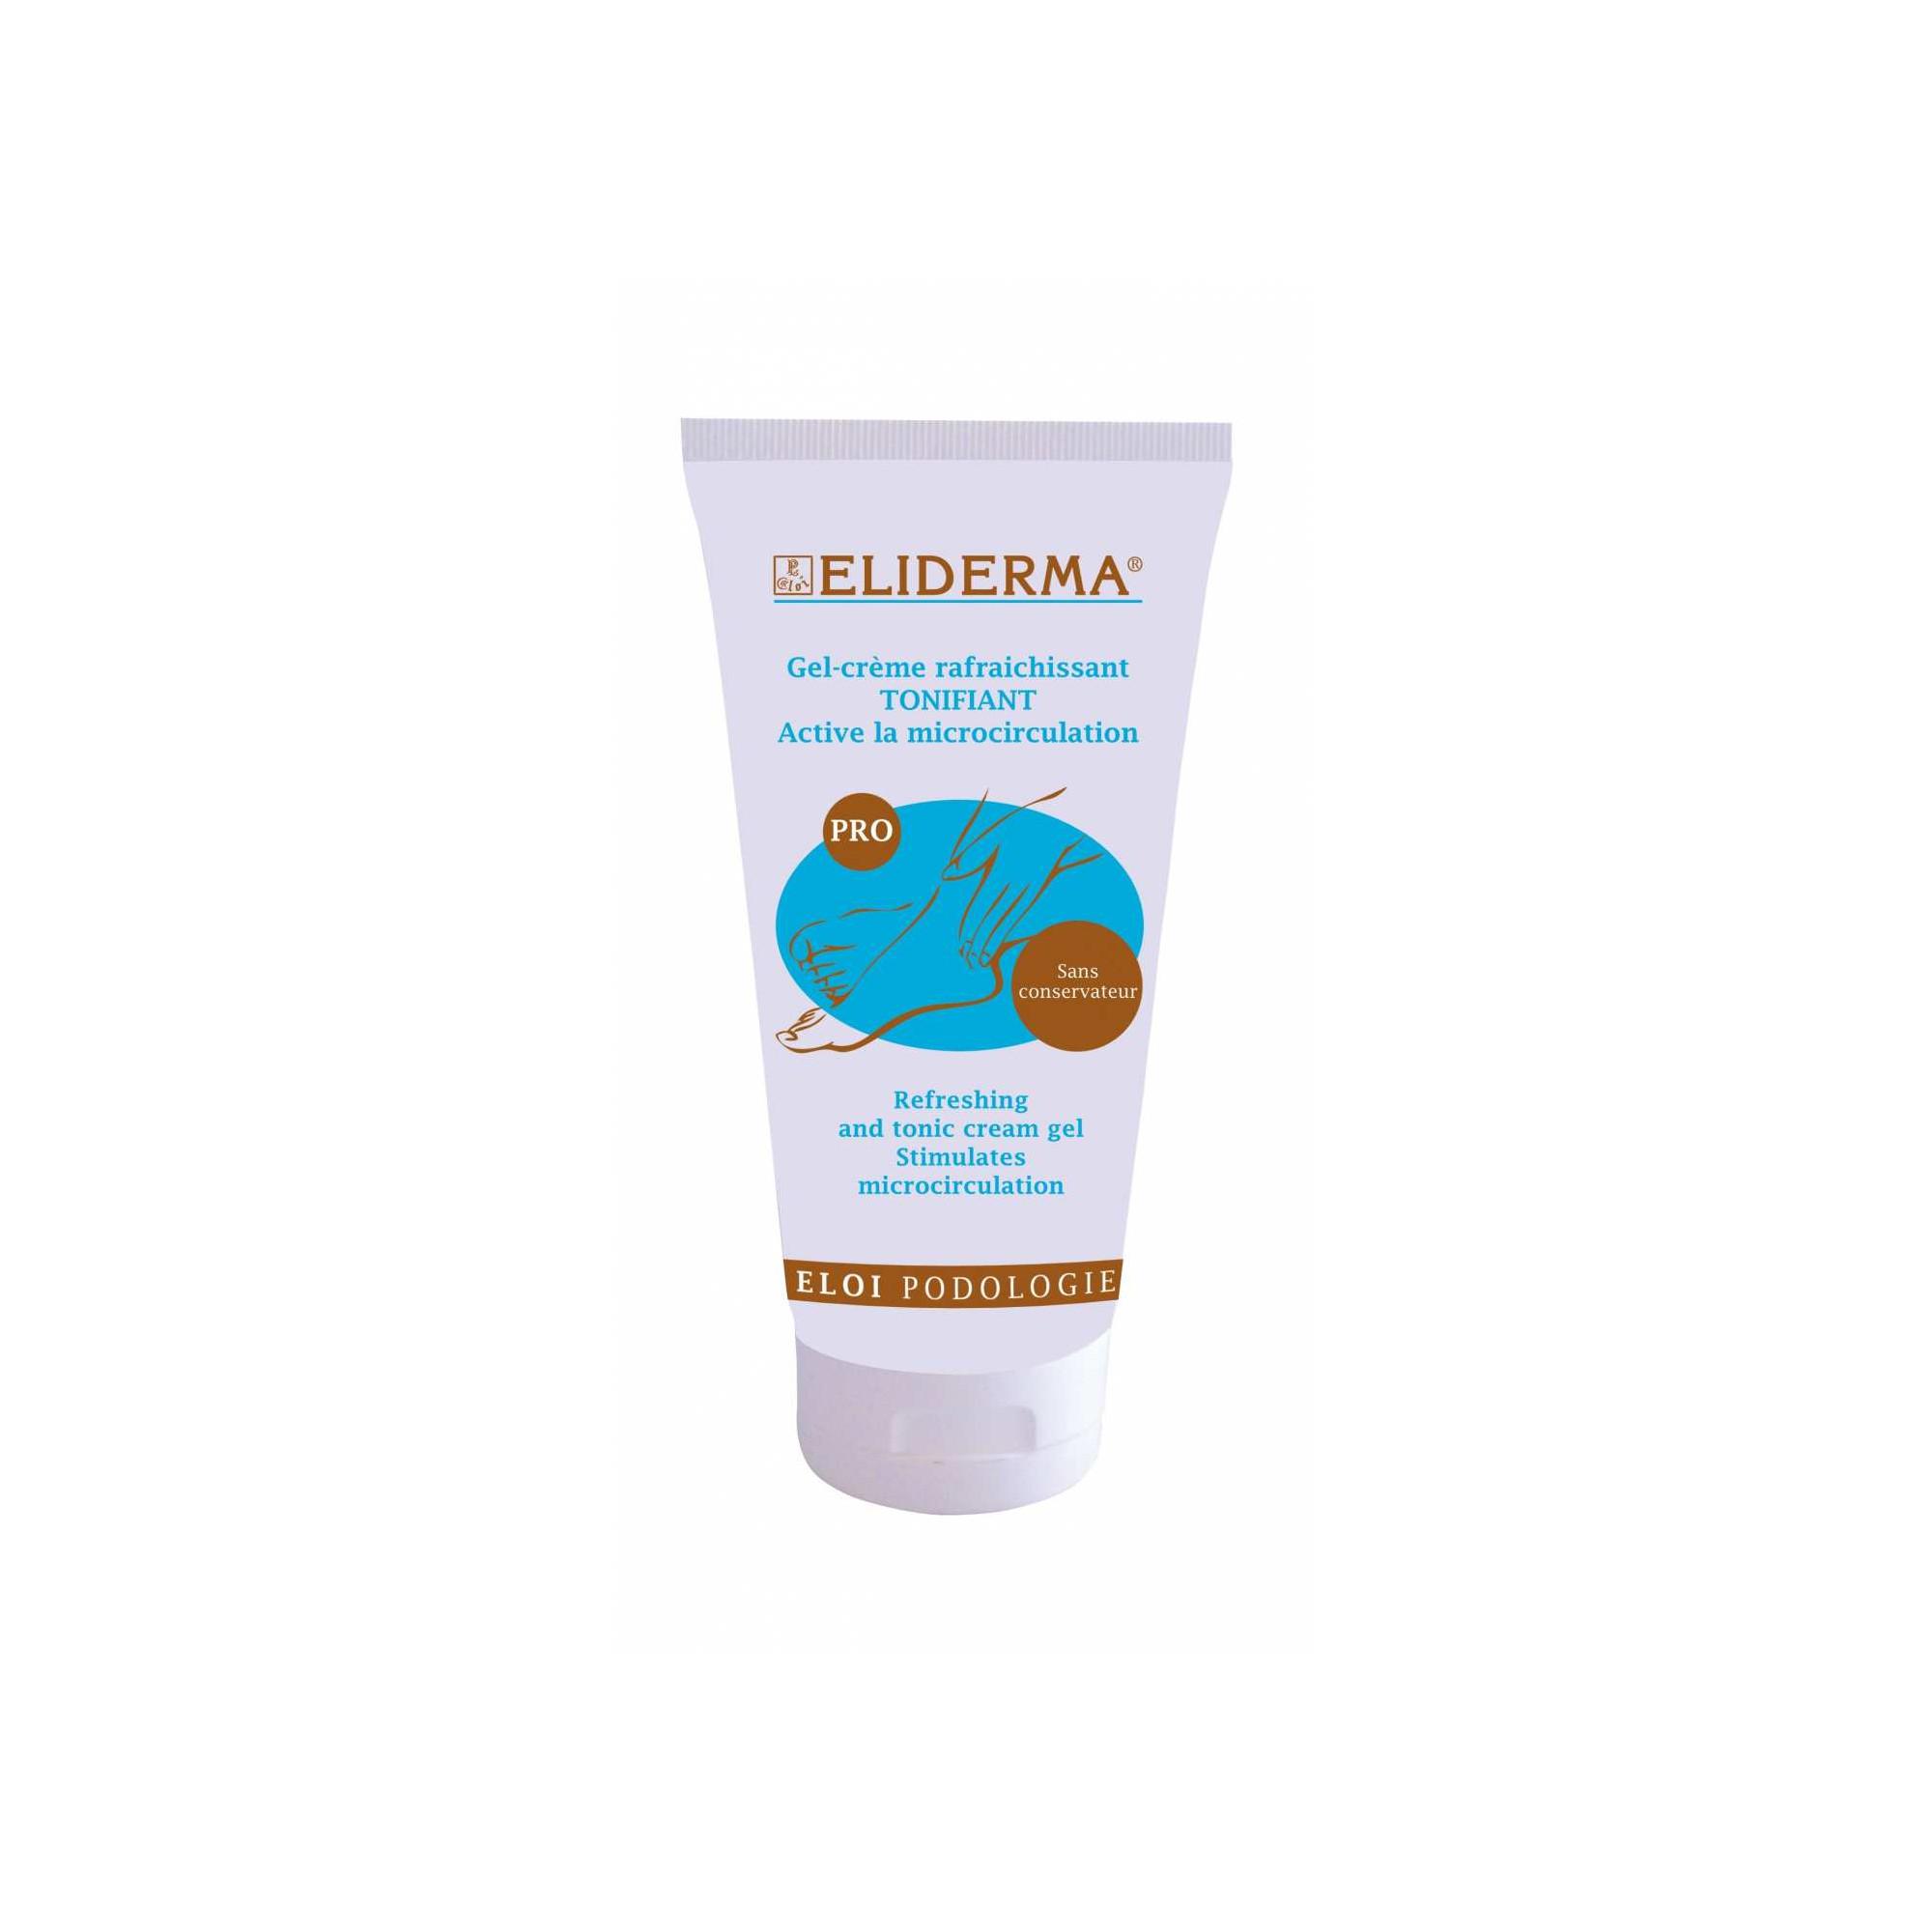 Gel crème Eliderma rafraichissant tonifiant - Active la microcirculation - 75 ml